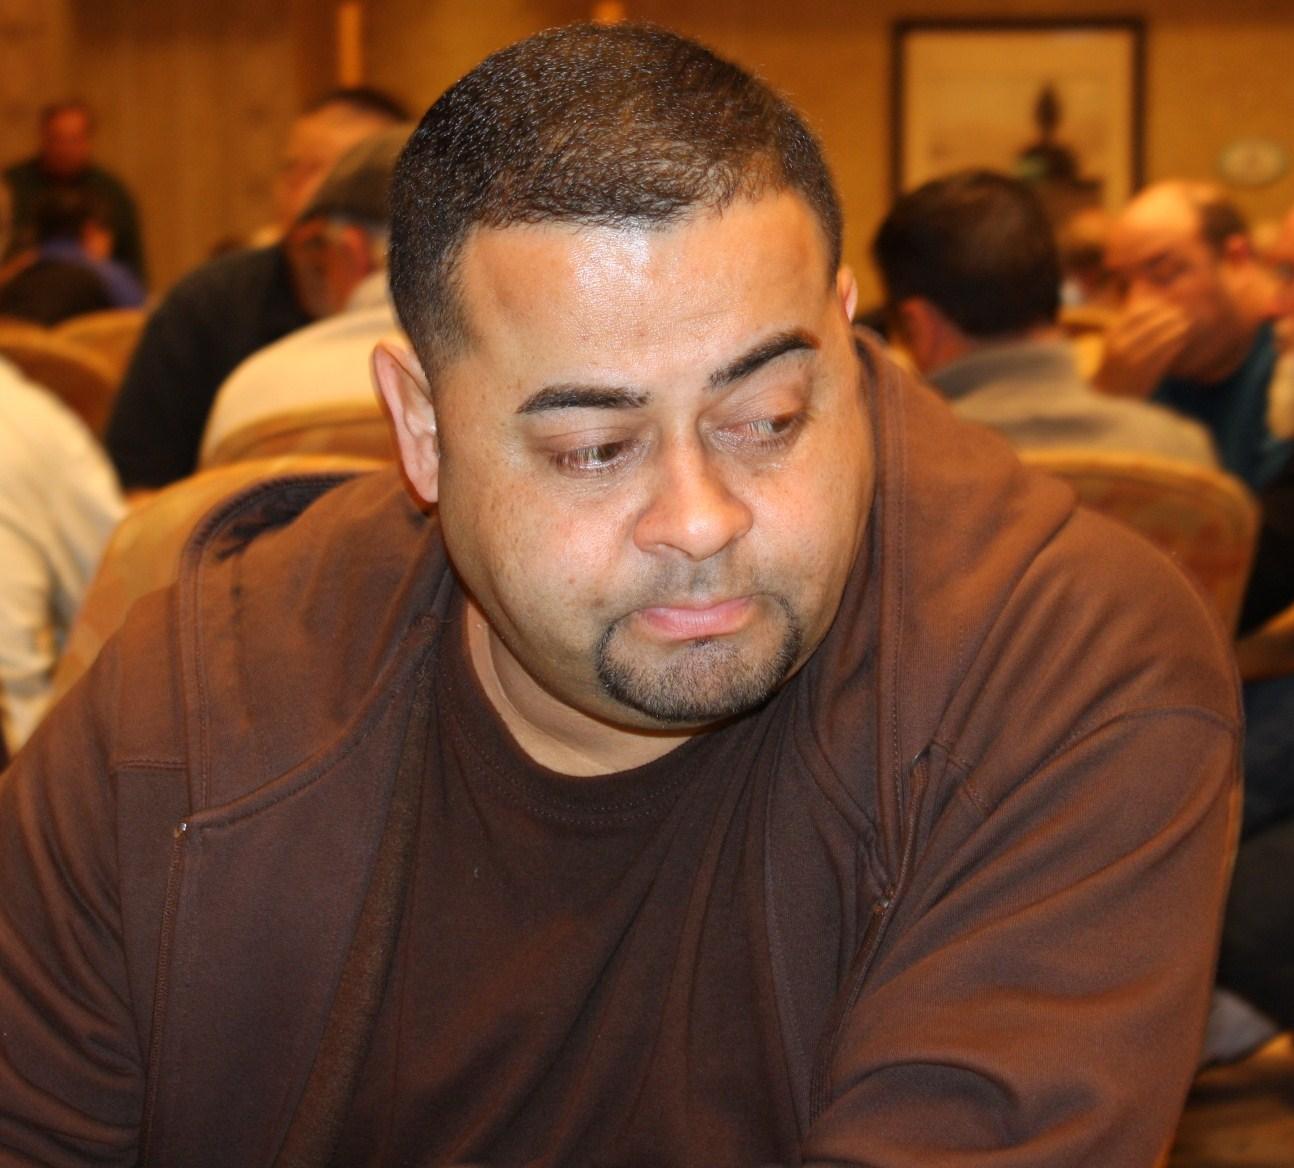 Borgata Fall Poker Open 2011 Nov 15 2011